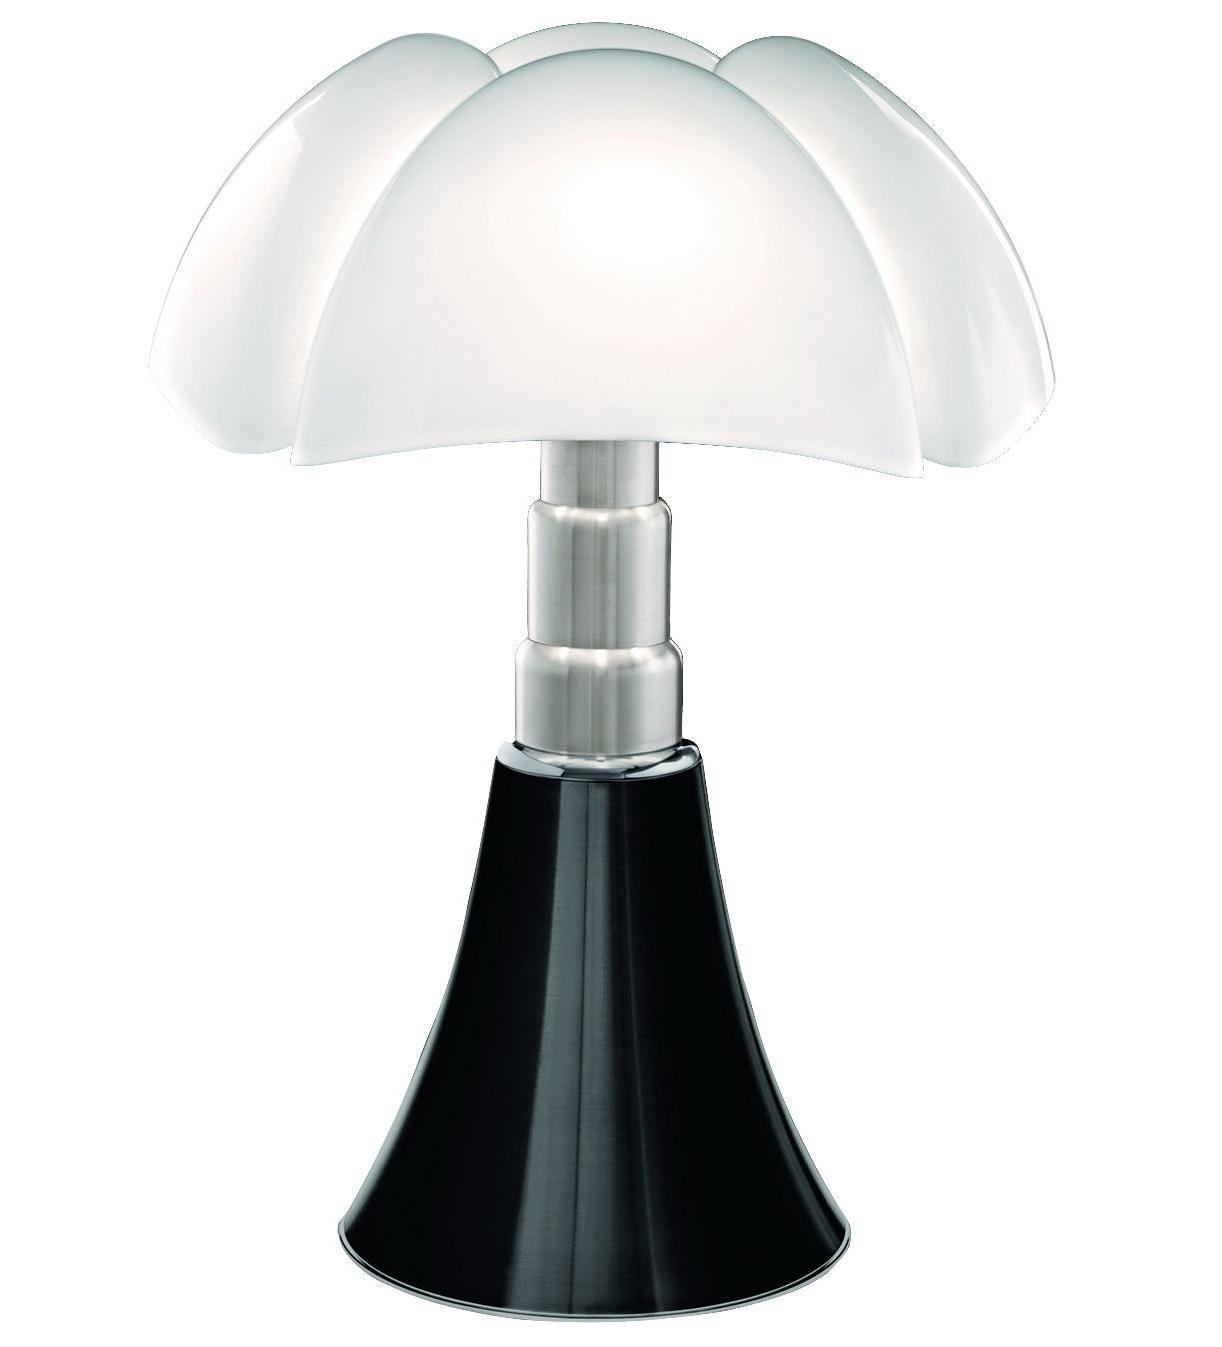 Lampe à poser PIPISTRELLO de Martinelli Luce, 5 coloris 9cd42457c153